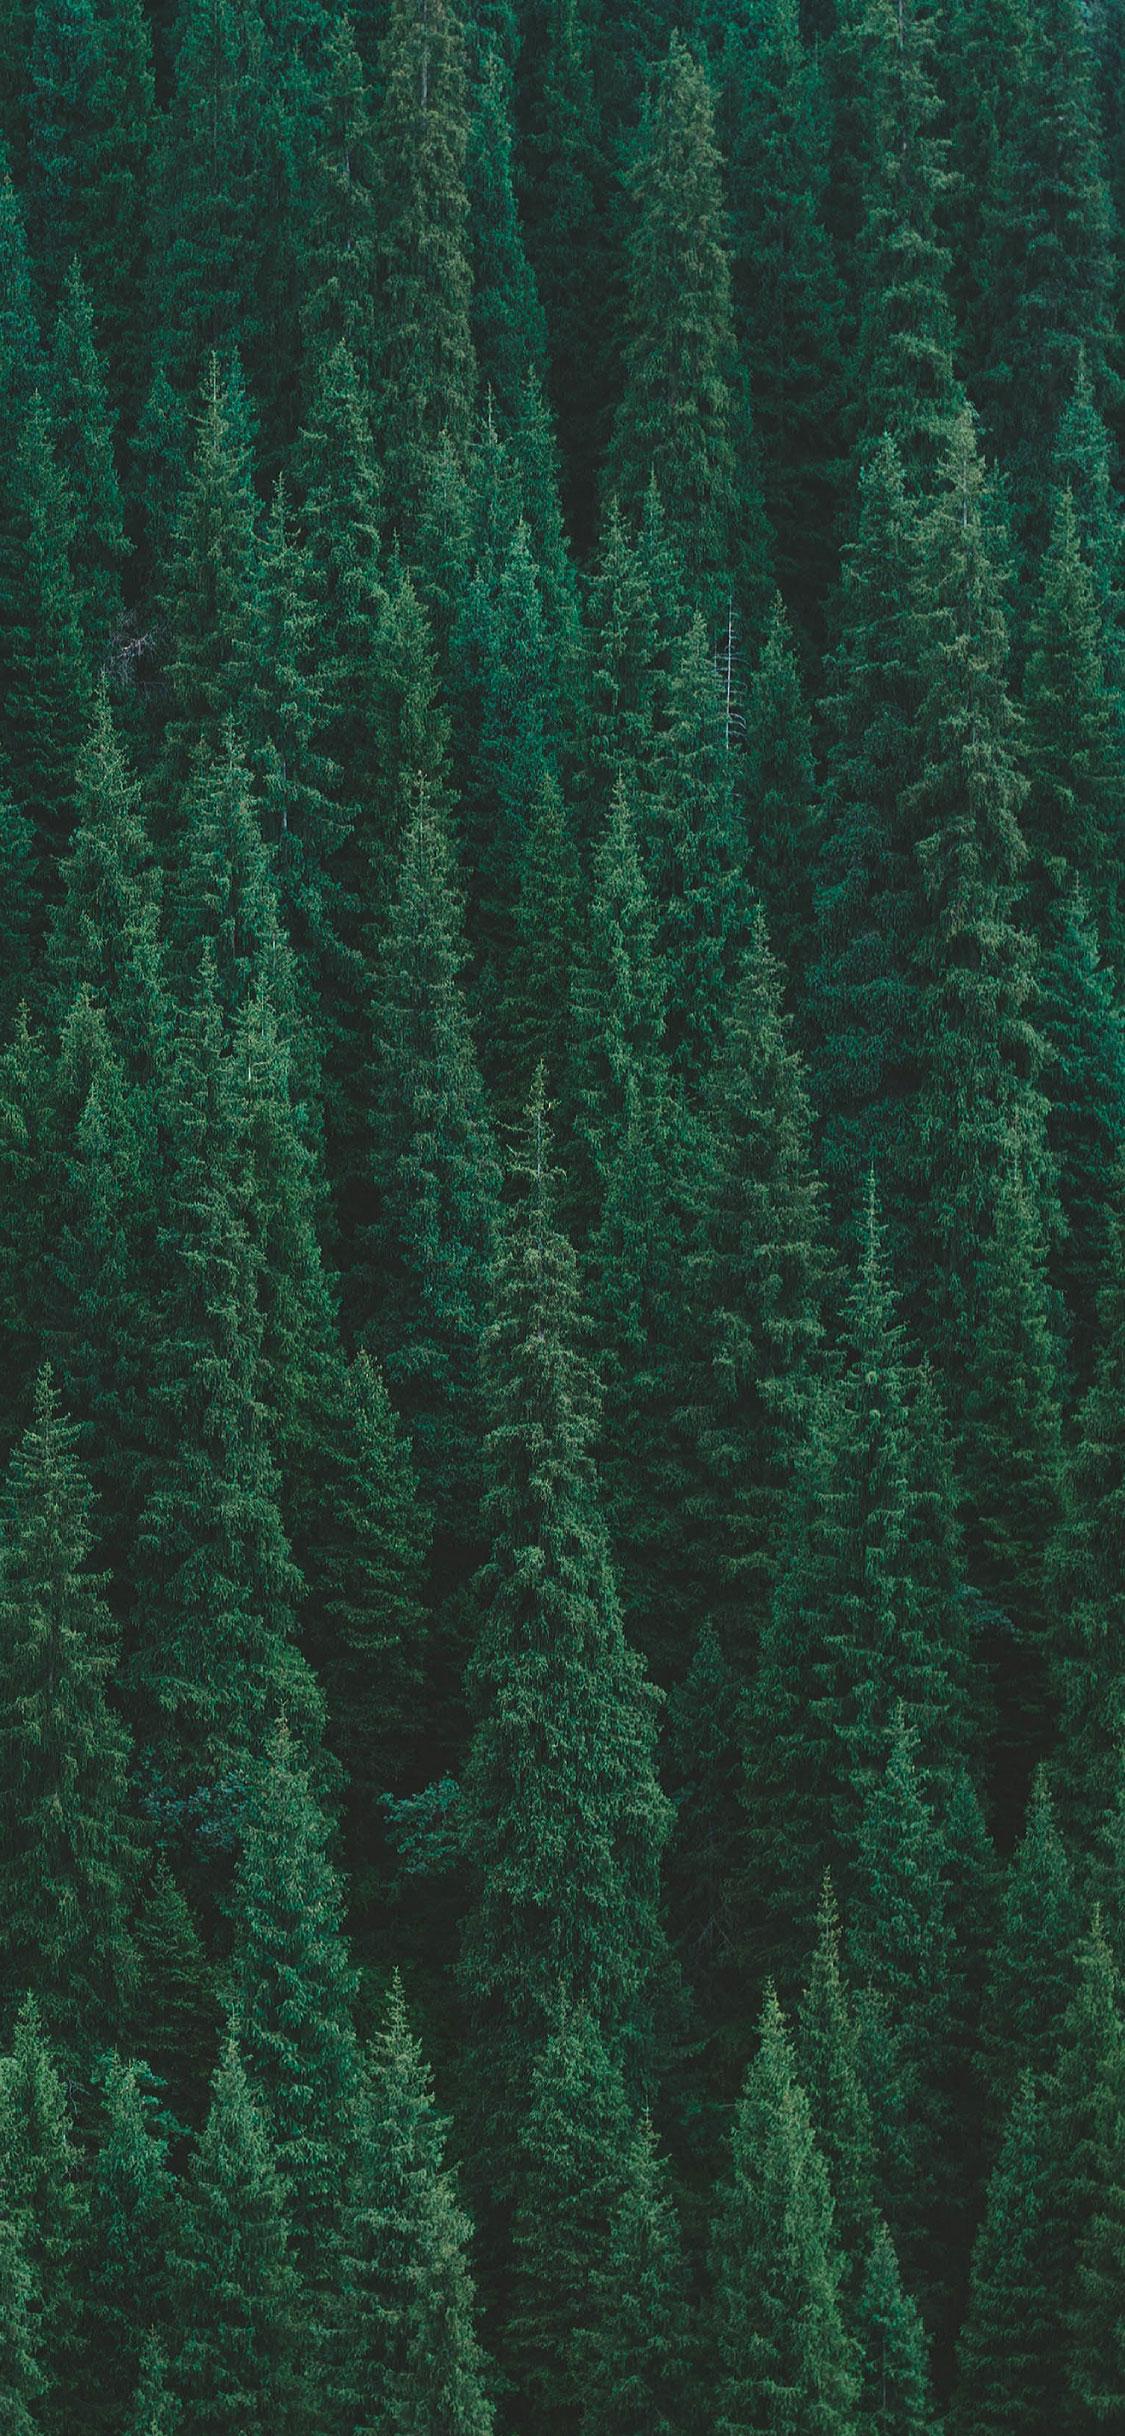 Popular Wallpaper Macbook Forest - Forest-Apple-iPhone-X-Wallpaper-1  Gallery_994170.jpg